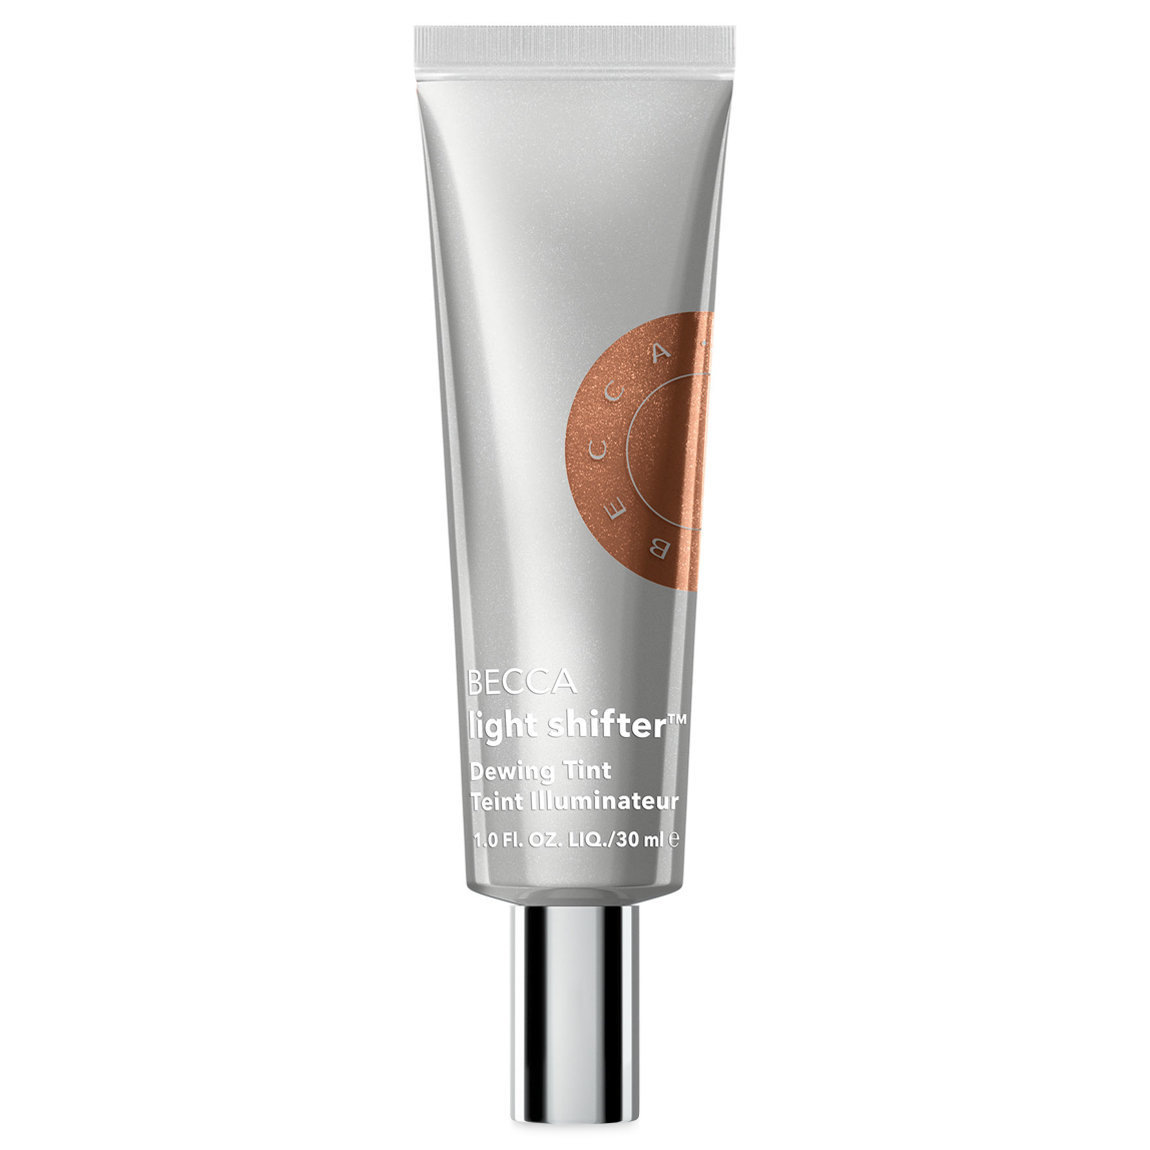 BECCA Cosmetics Light Shifter Dewing Tint Borealis 5.5 alternative view 1.